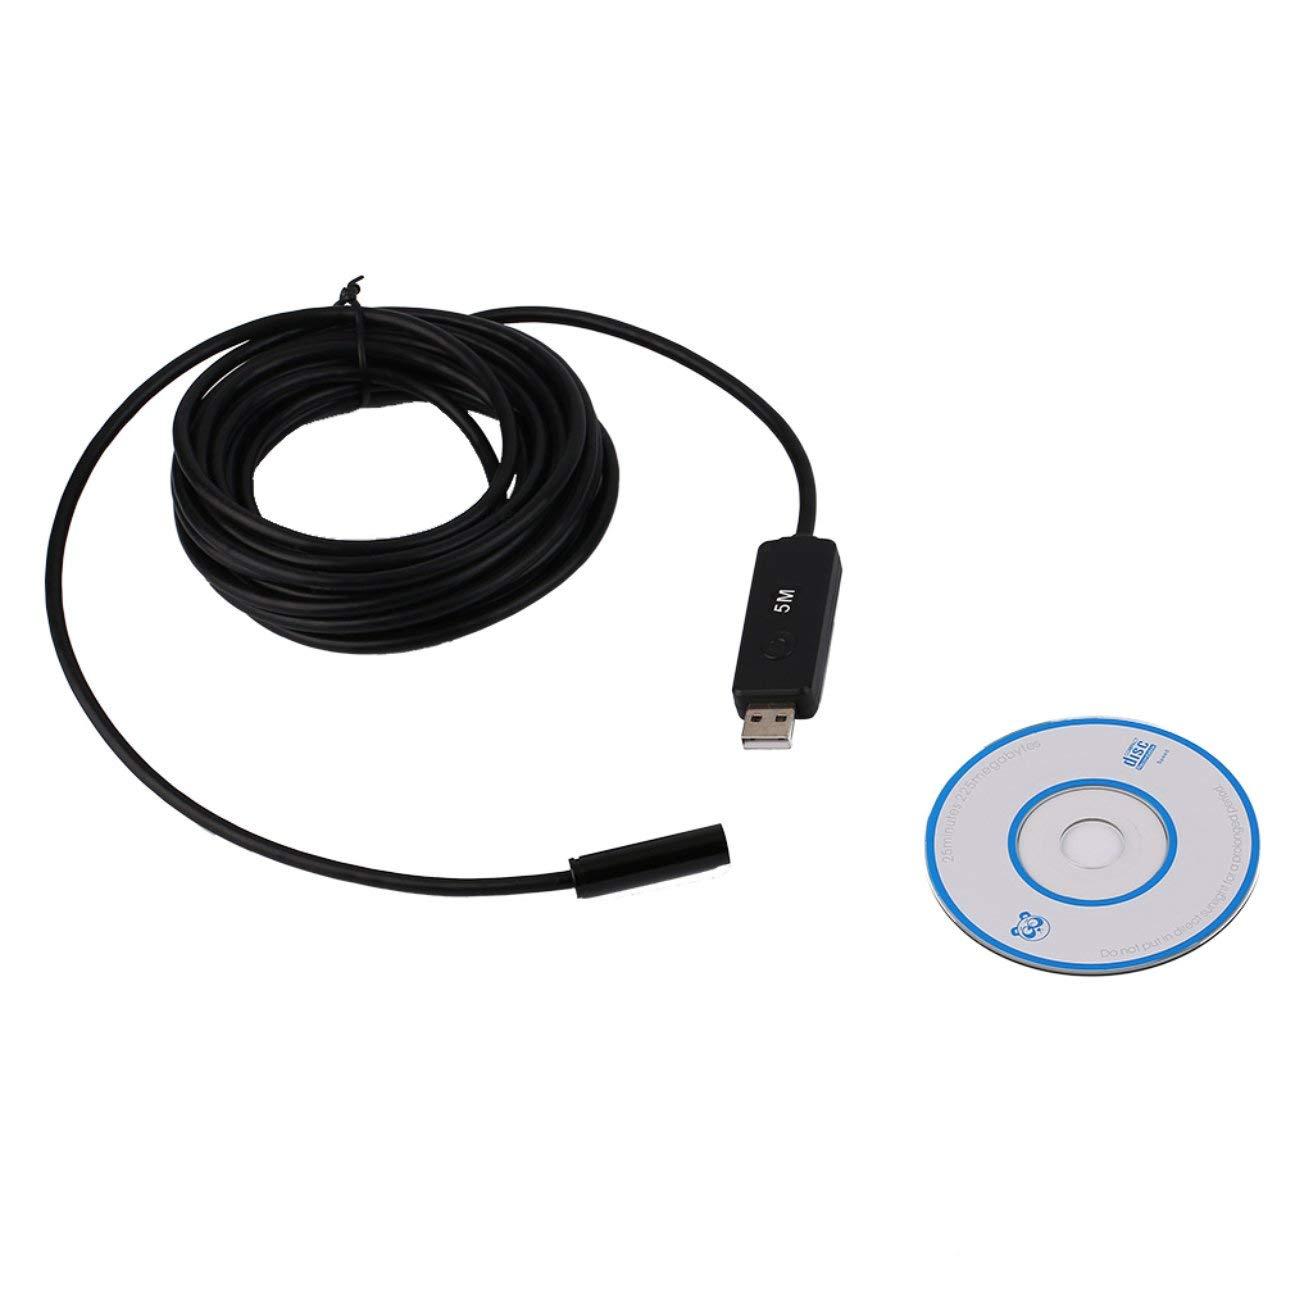 MachinYesell 5M 10mm 4 LED USB Etanche 4LED USB Endoscope Borescope Inspection Serpent Tube Mini Endoscope Cam/éra Noir